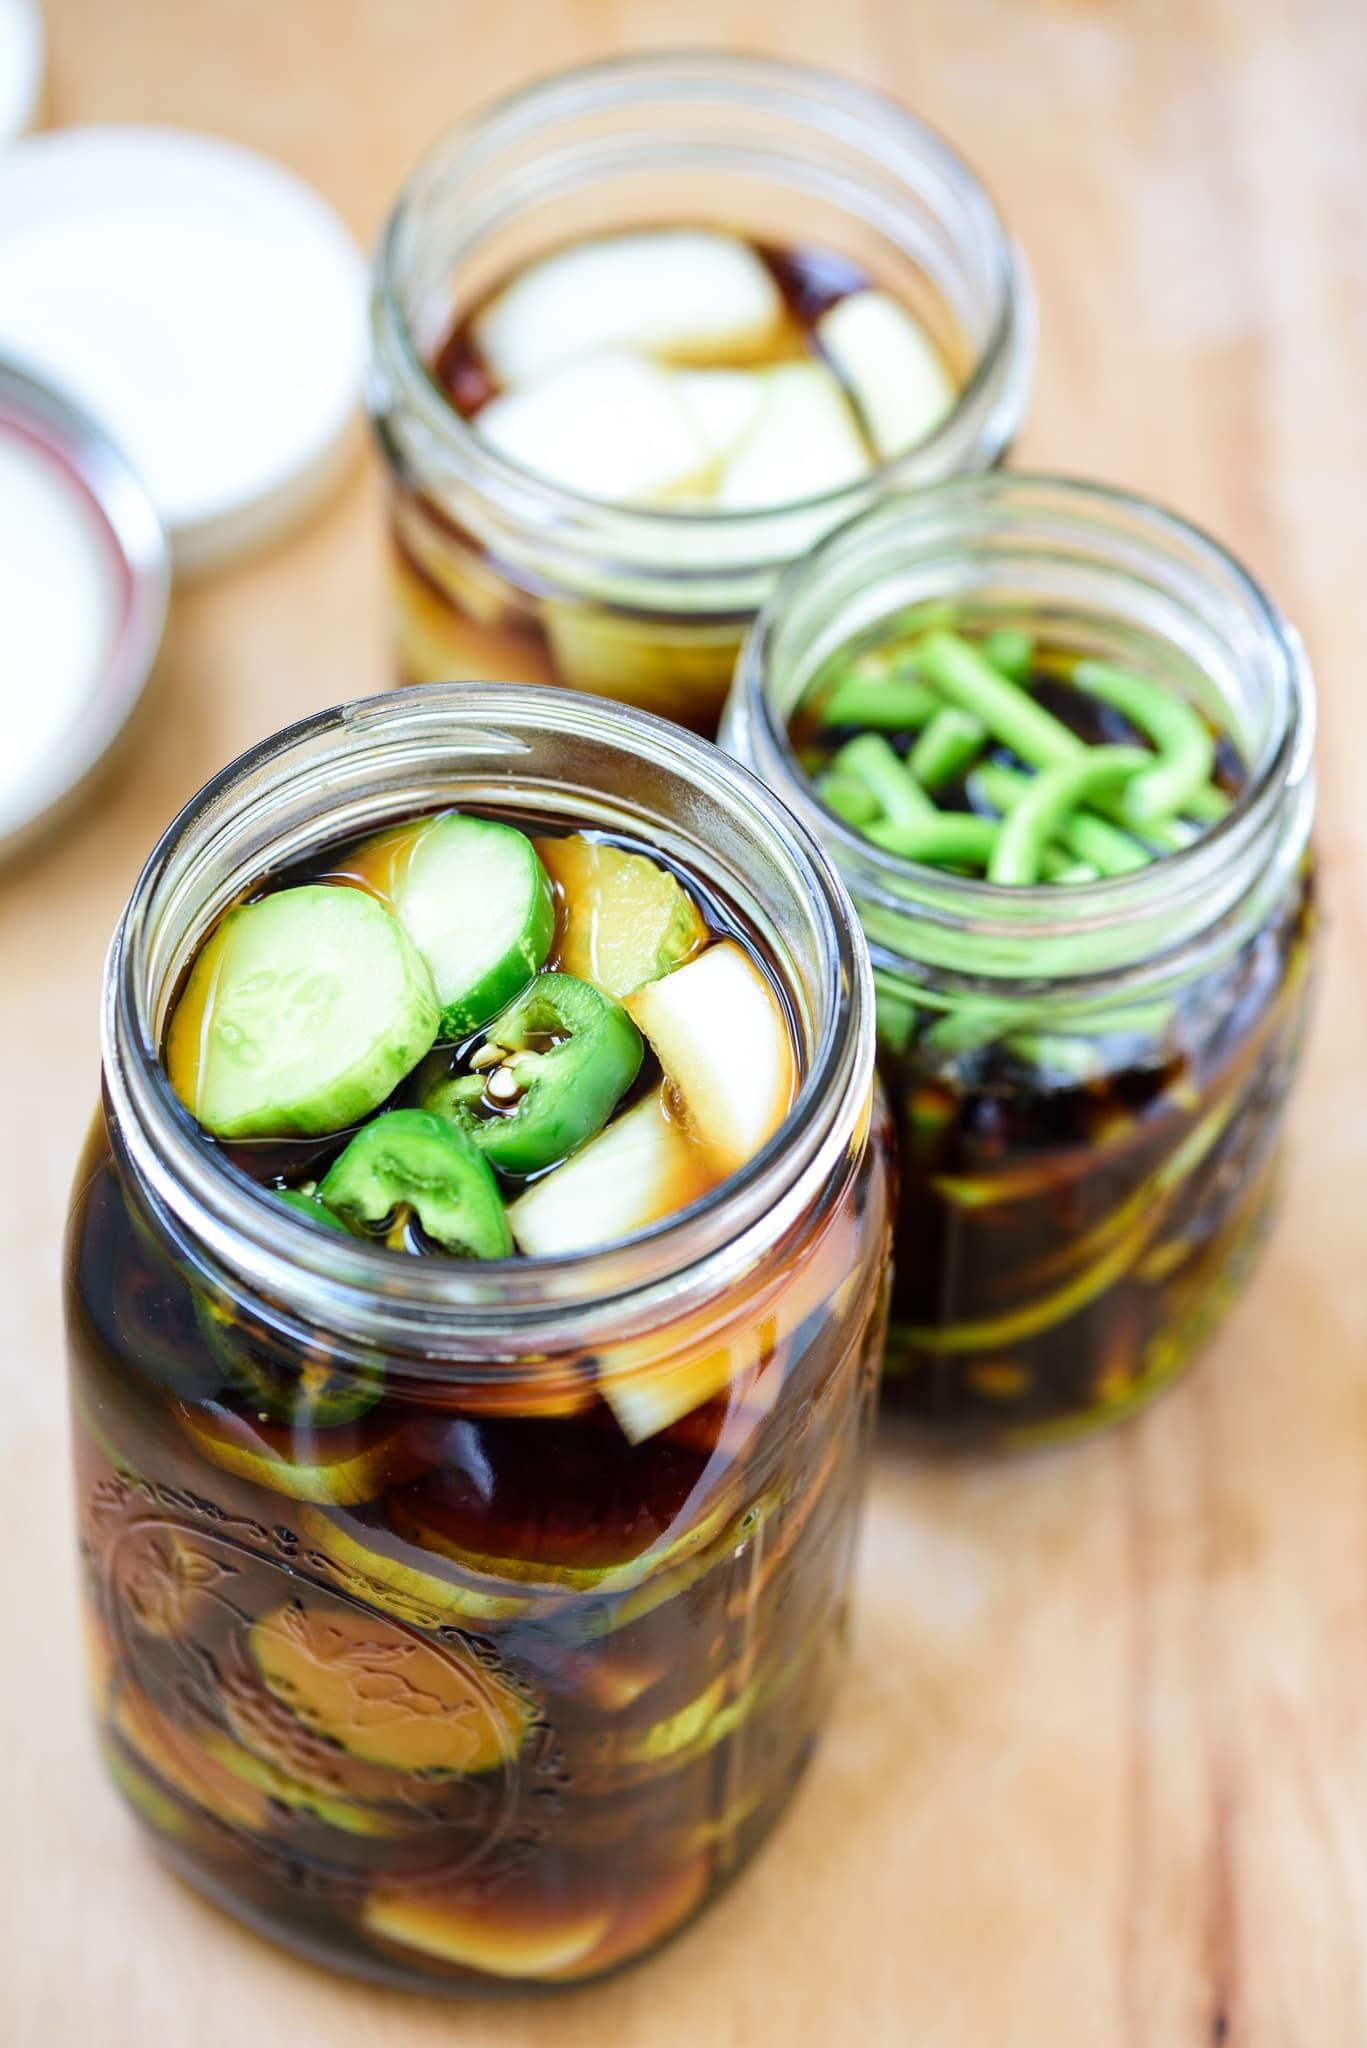 DSC2124 - Jangajji (Vegetable Pickles)